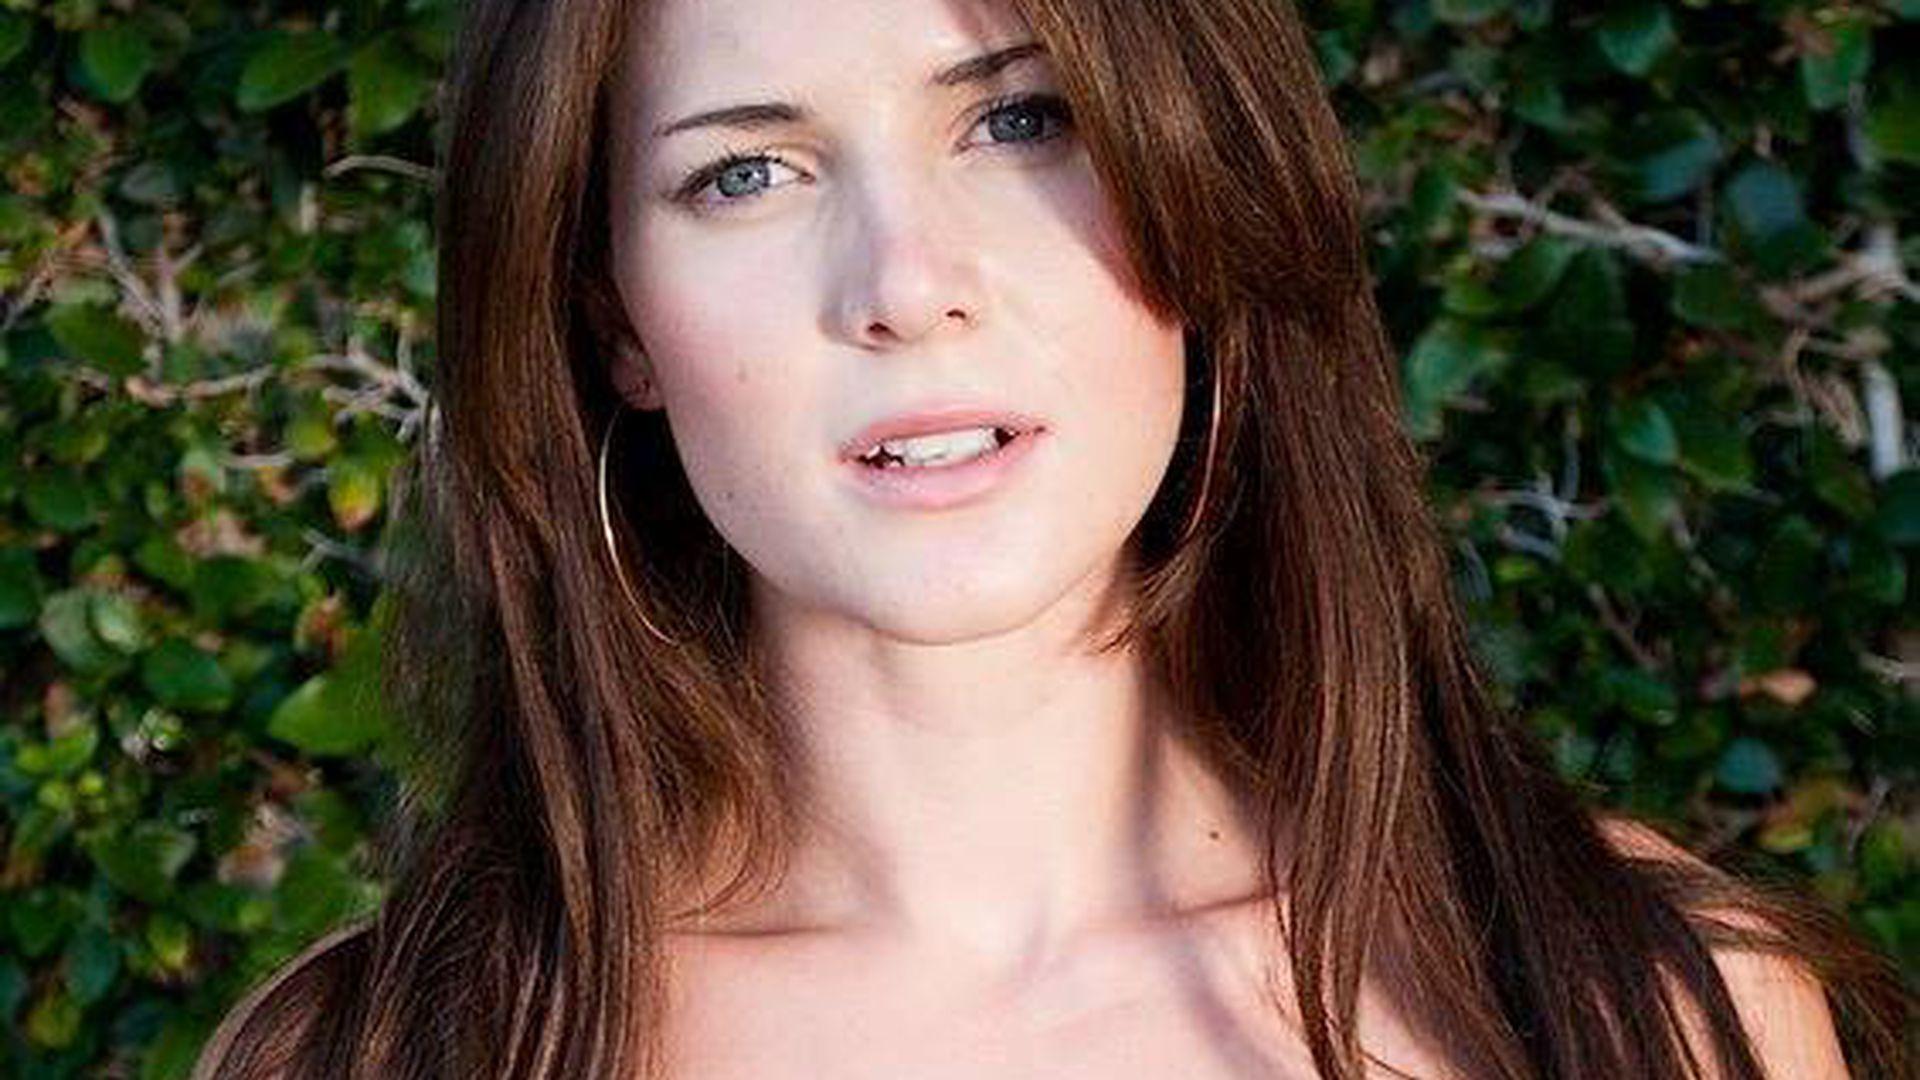 An Lee Porn ex porn star jenni lee lives in a drain in vegas!